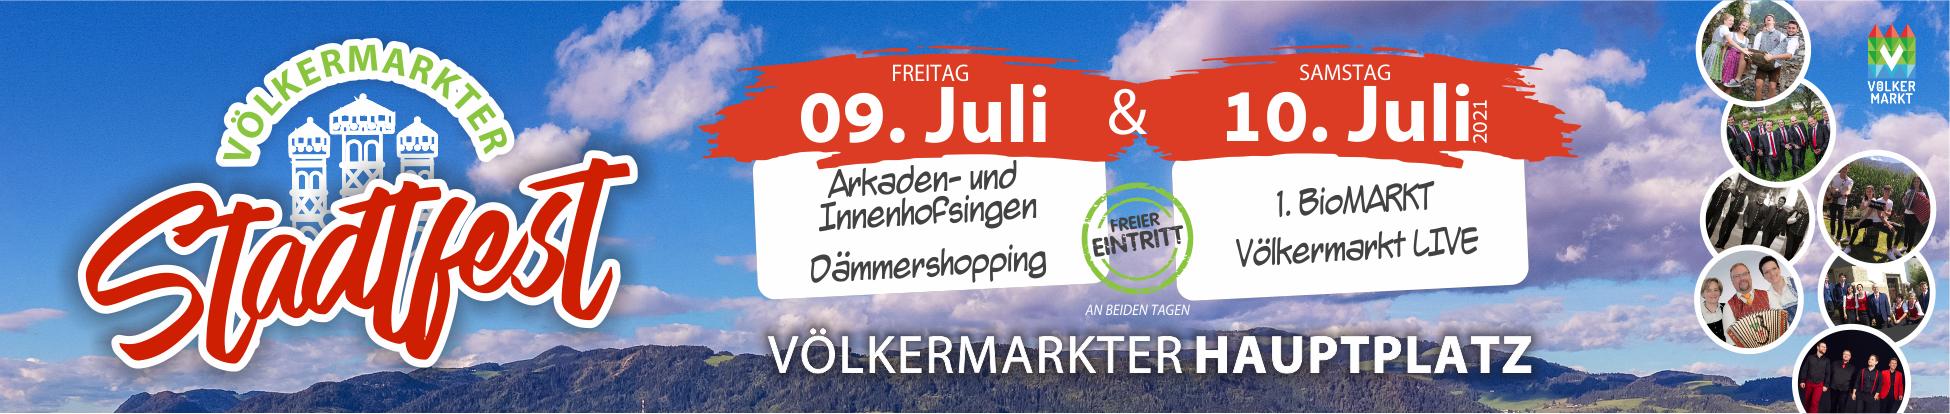 Grafik_Website_Gemeinde_Stadtfest2021